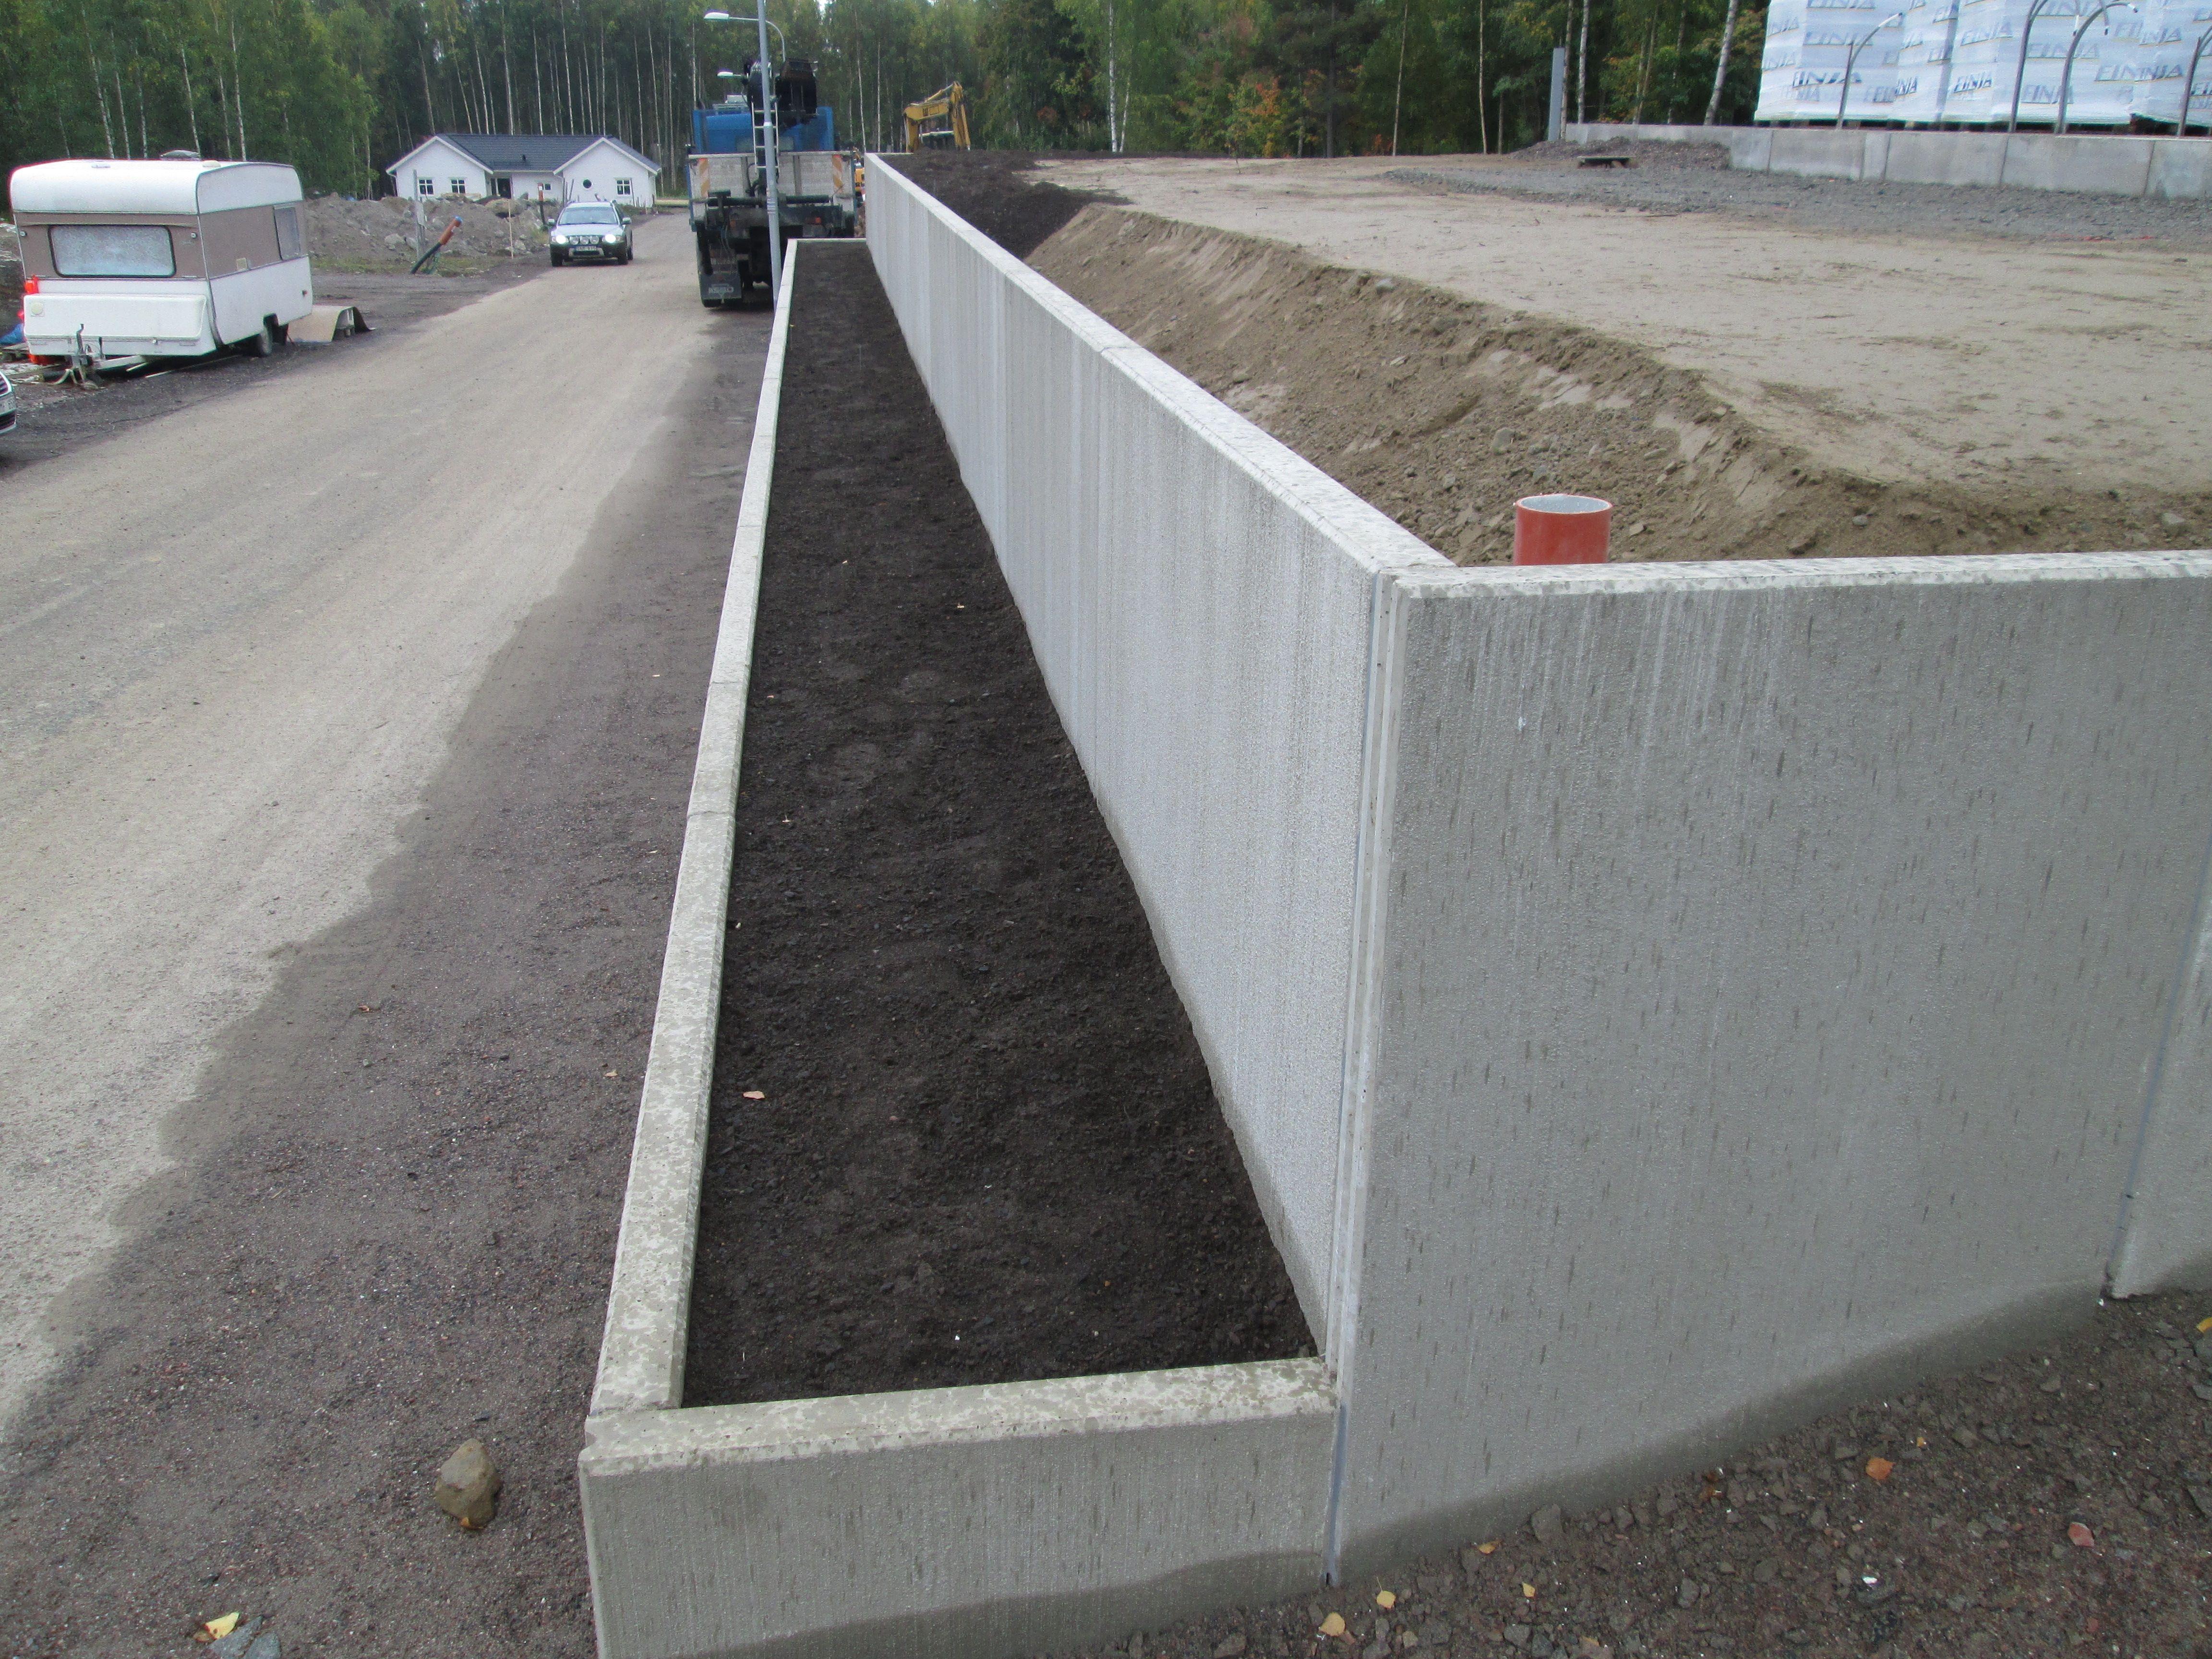 Tradgardsmur Sok Pa Google Hageplanlegging Stottemur Utendorsliv